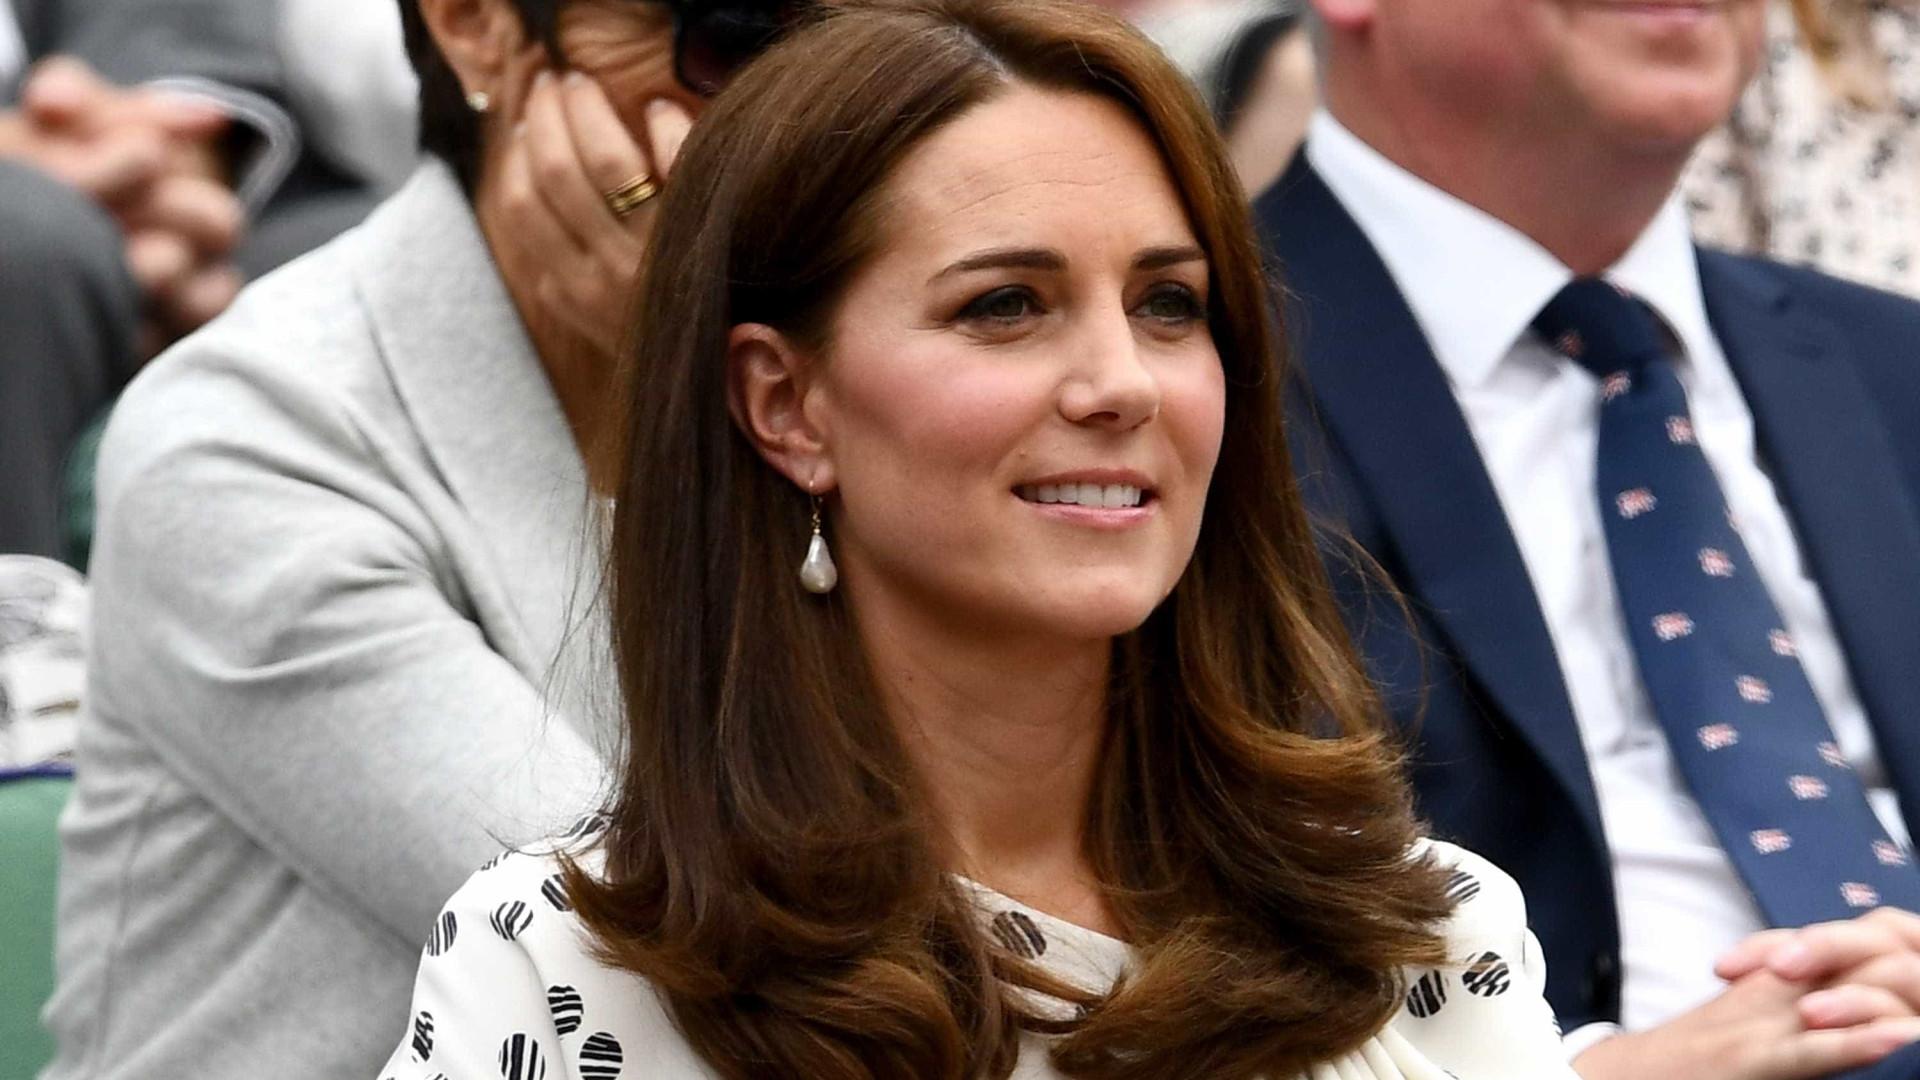 'Apoio acaba depois do 1º ano', diz Kate Middleton sobre maternidade